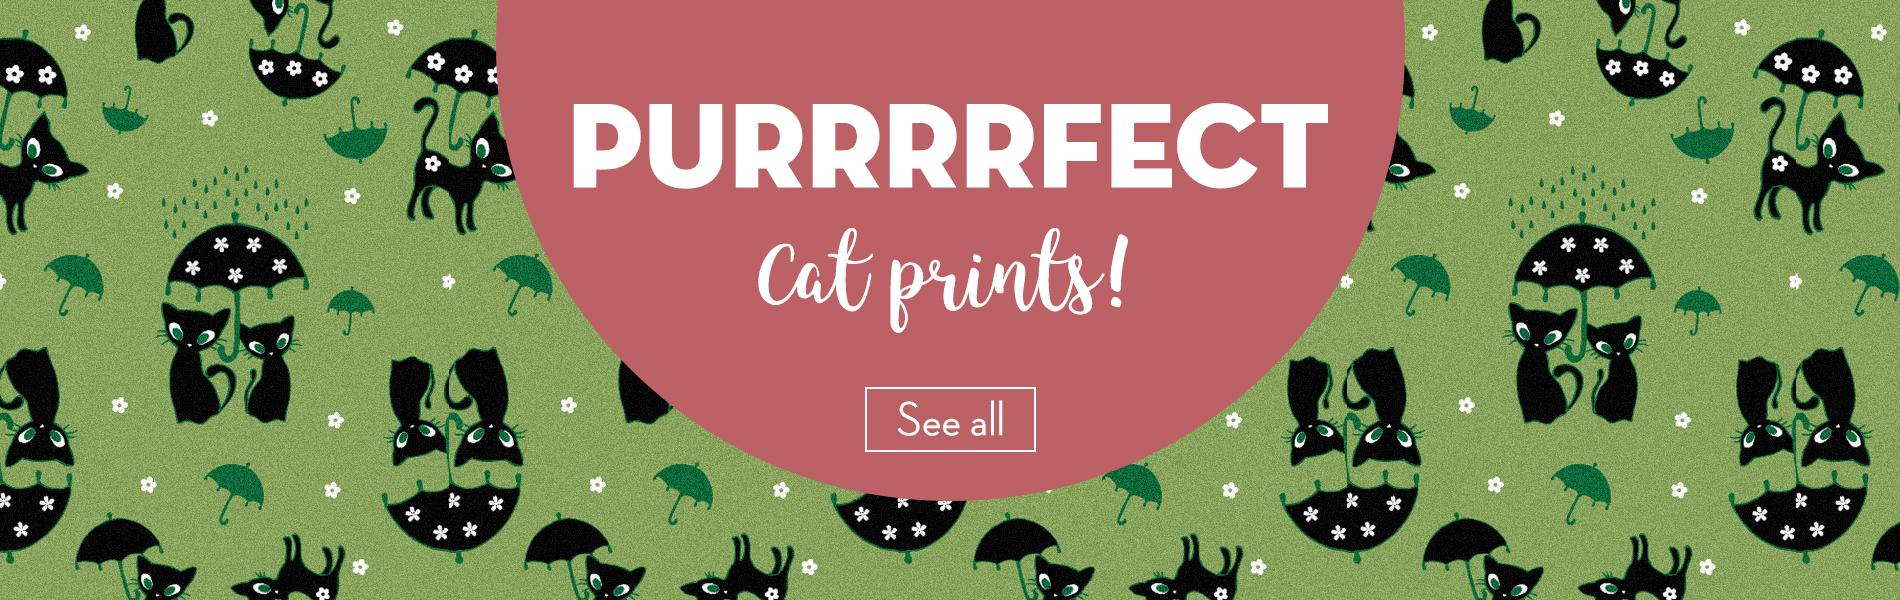 Cat print dress cardigan